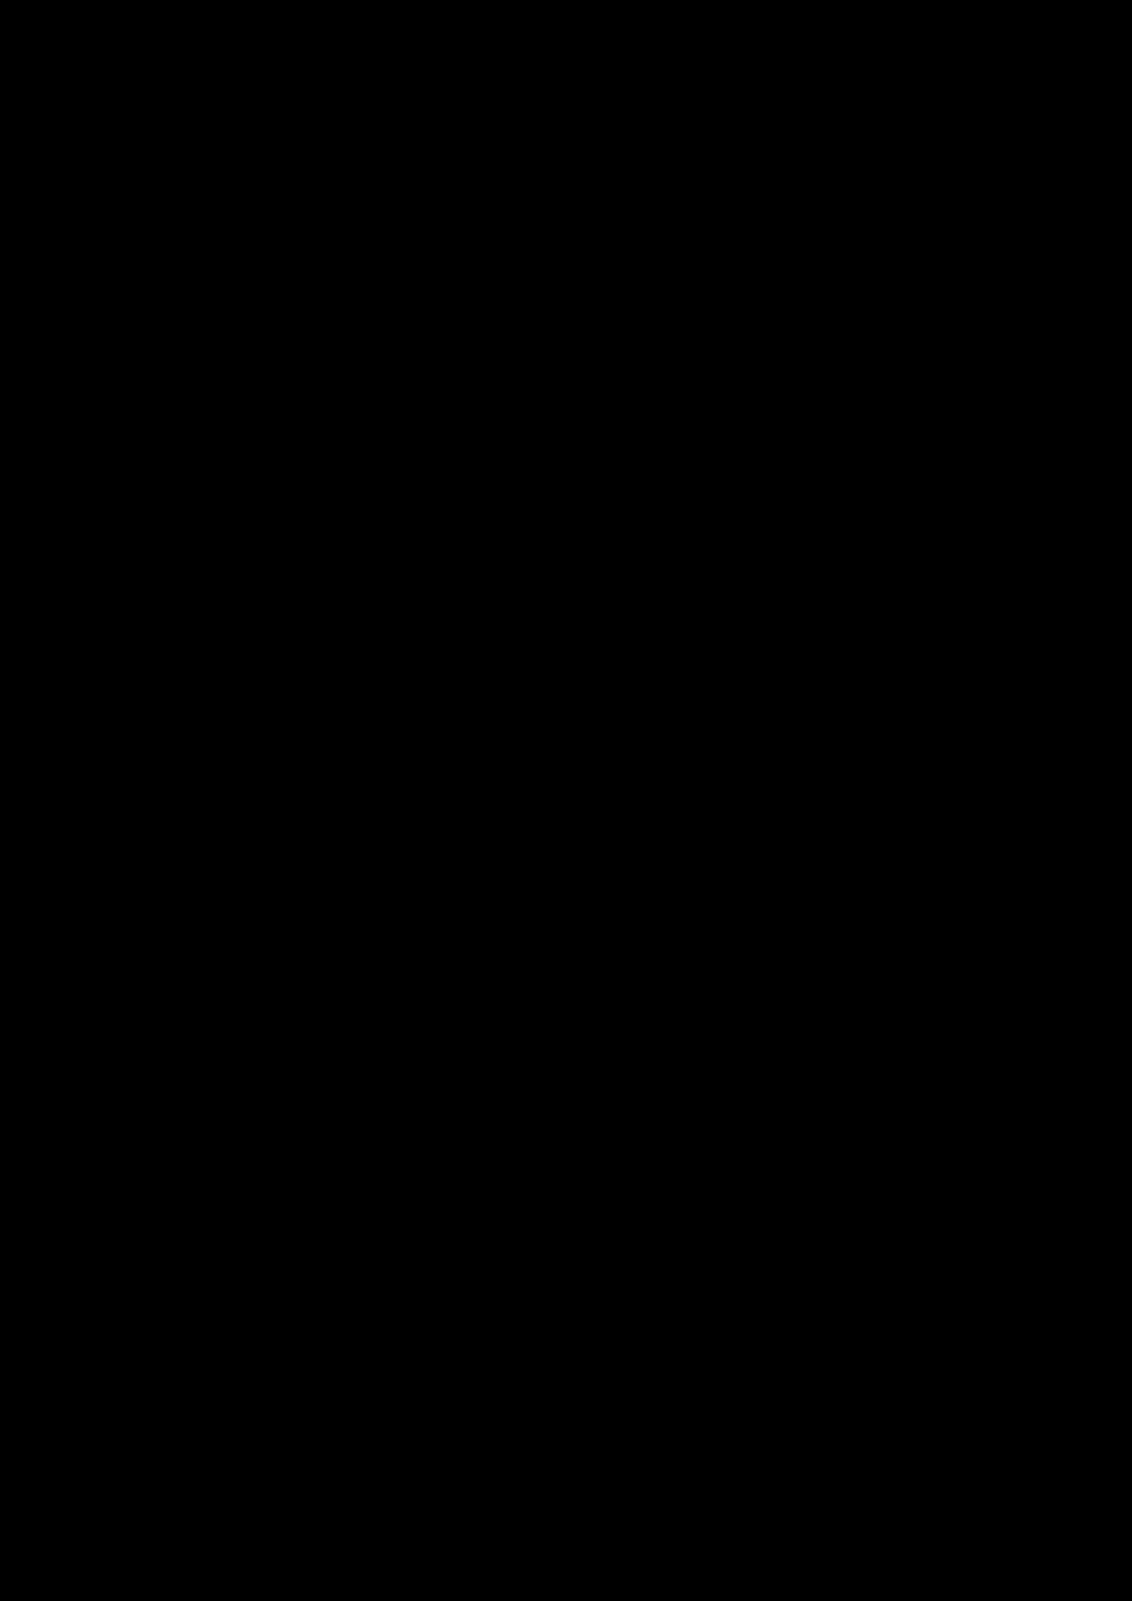 Belyiy sokol slide, Image 201